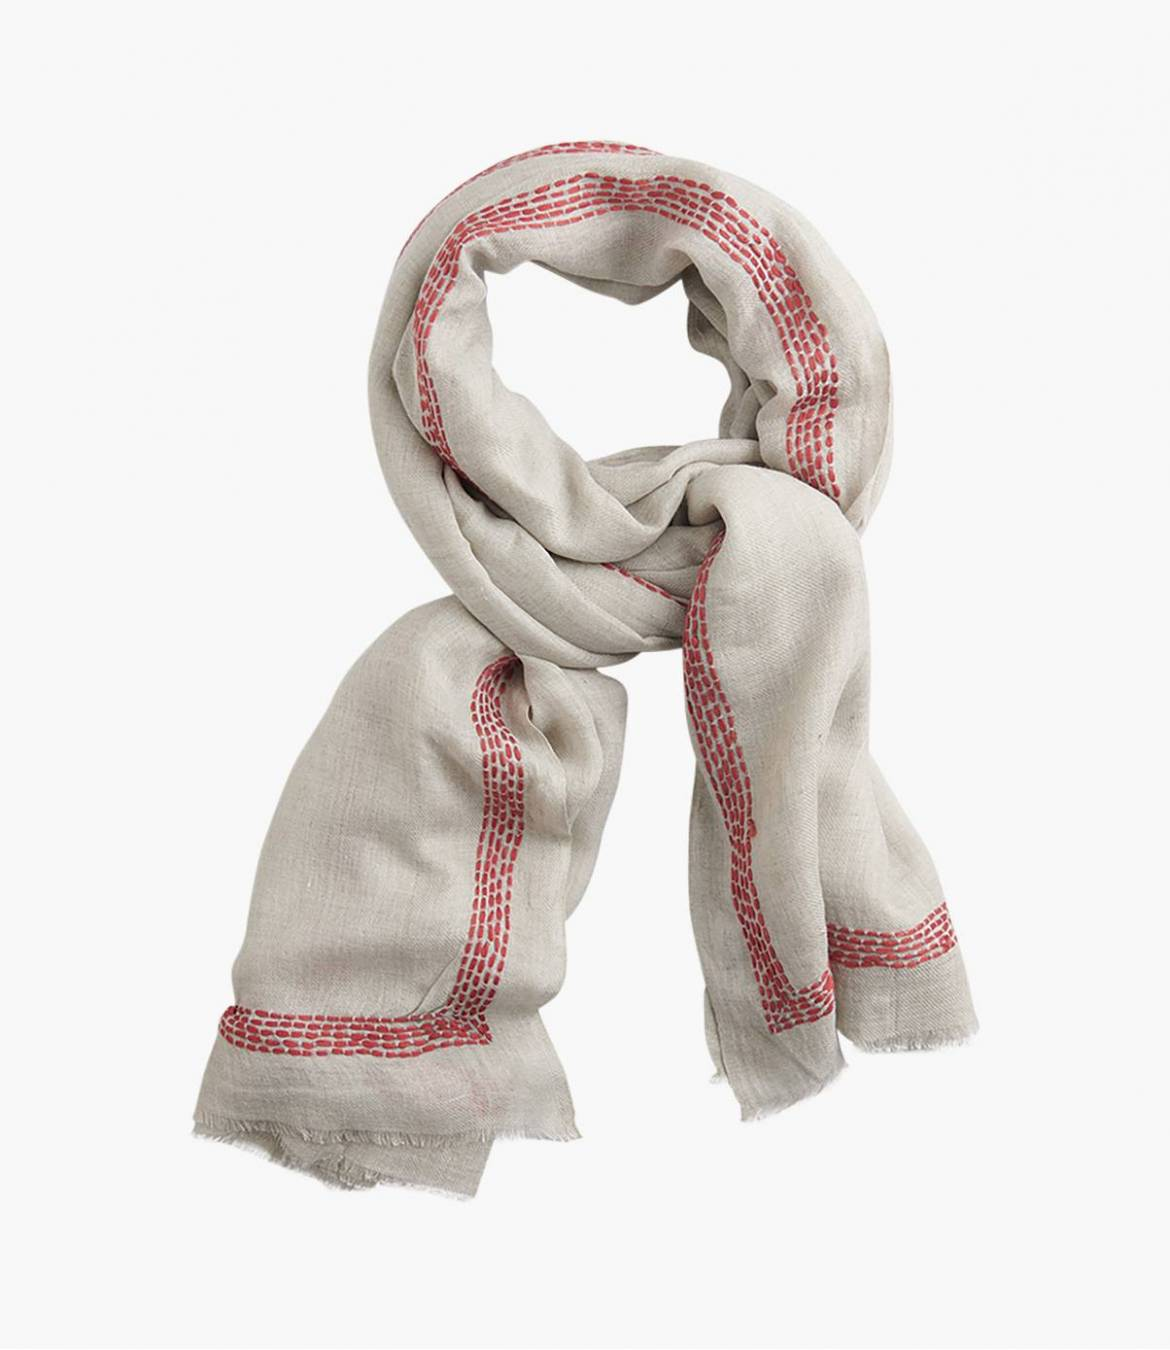 FONDANTE Scarf in Modal, Wool, Cotton for Women 100x200 cm Storiatipic - 1